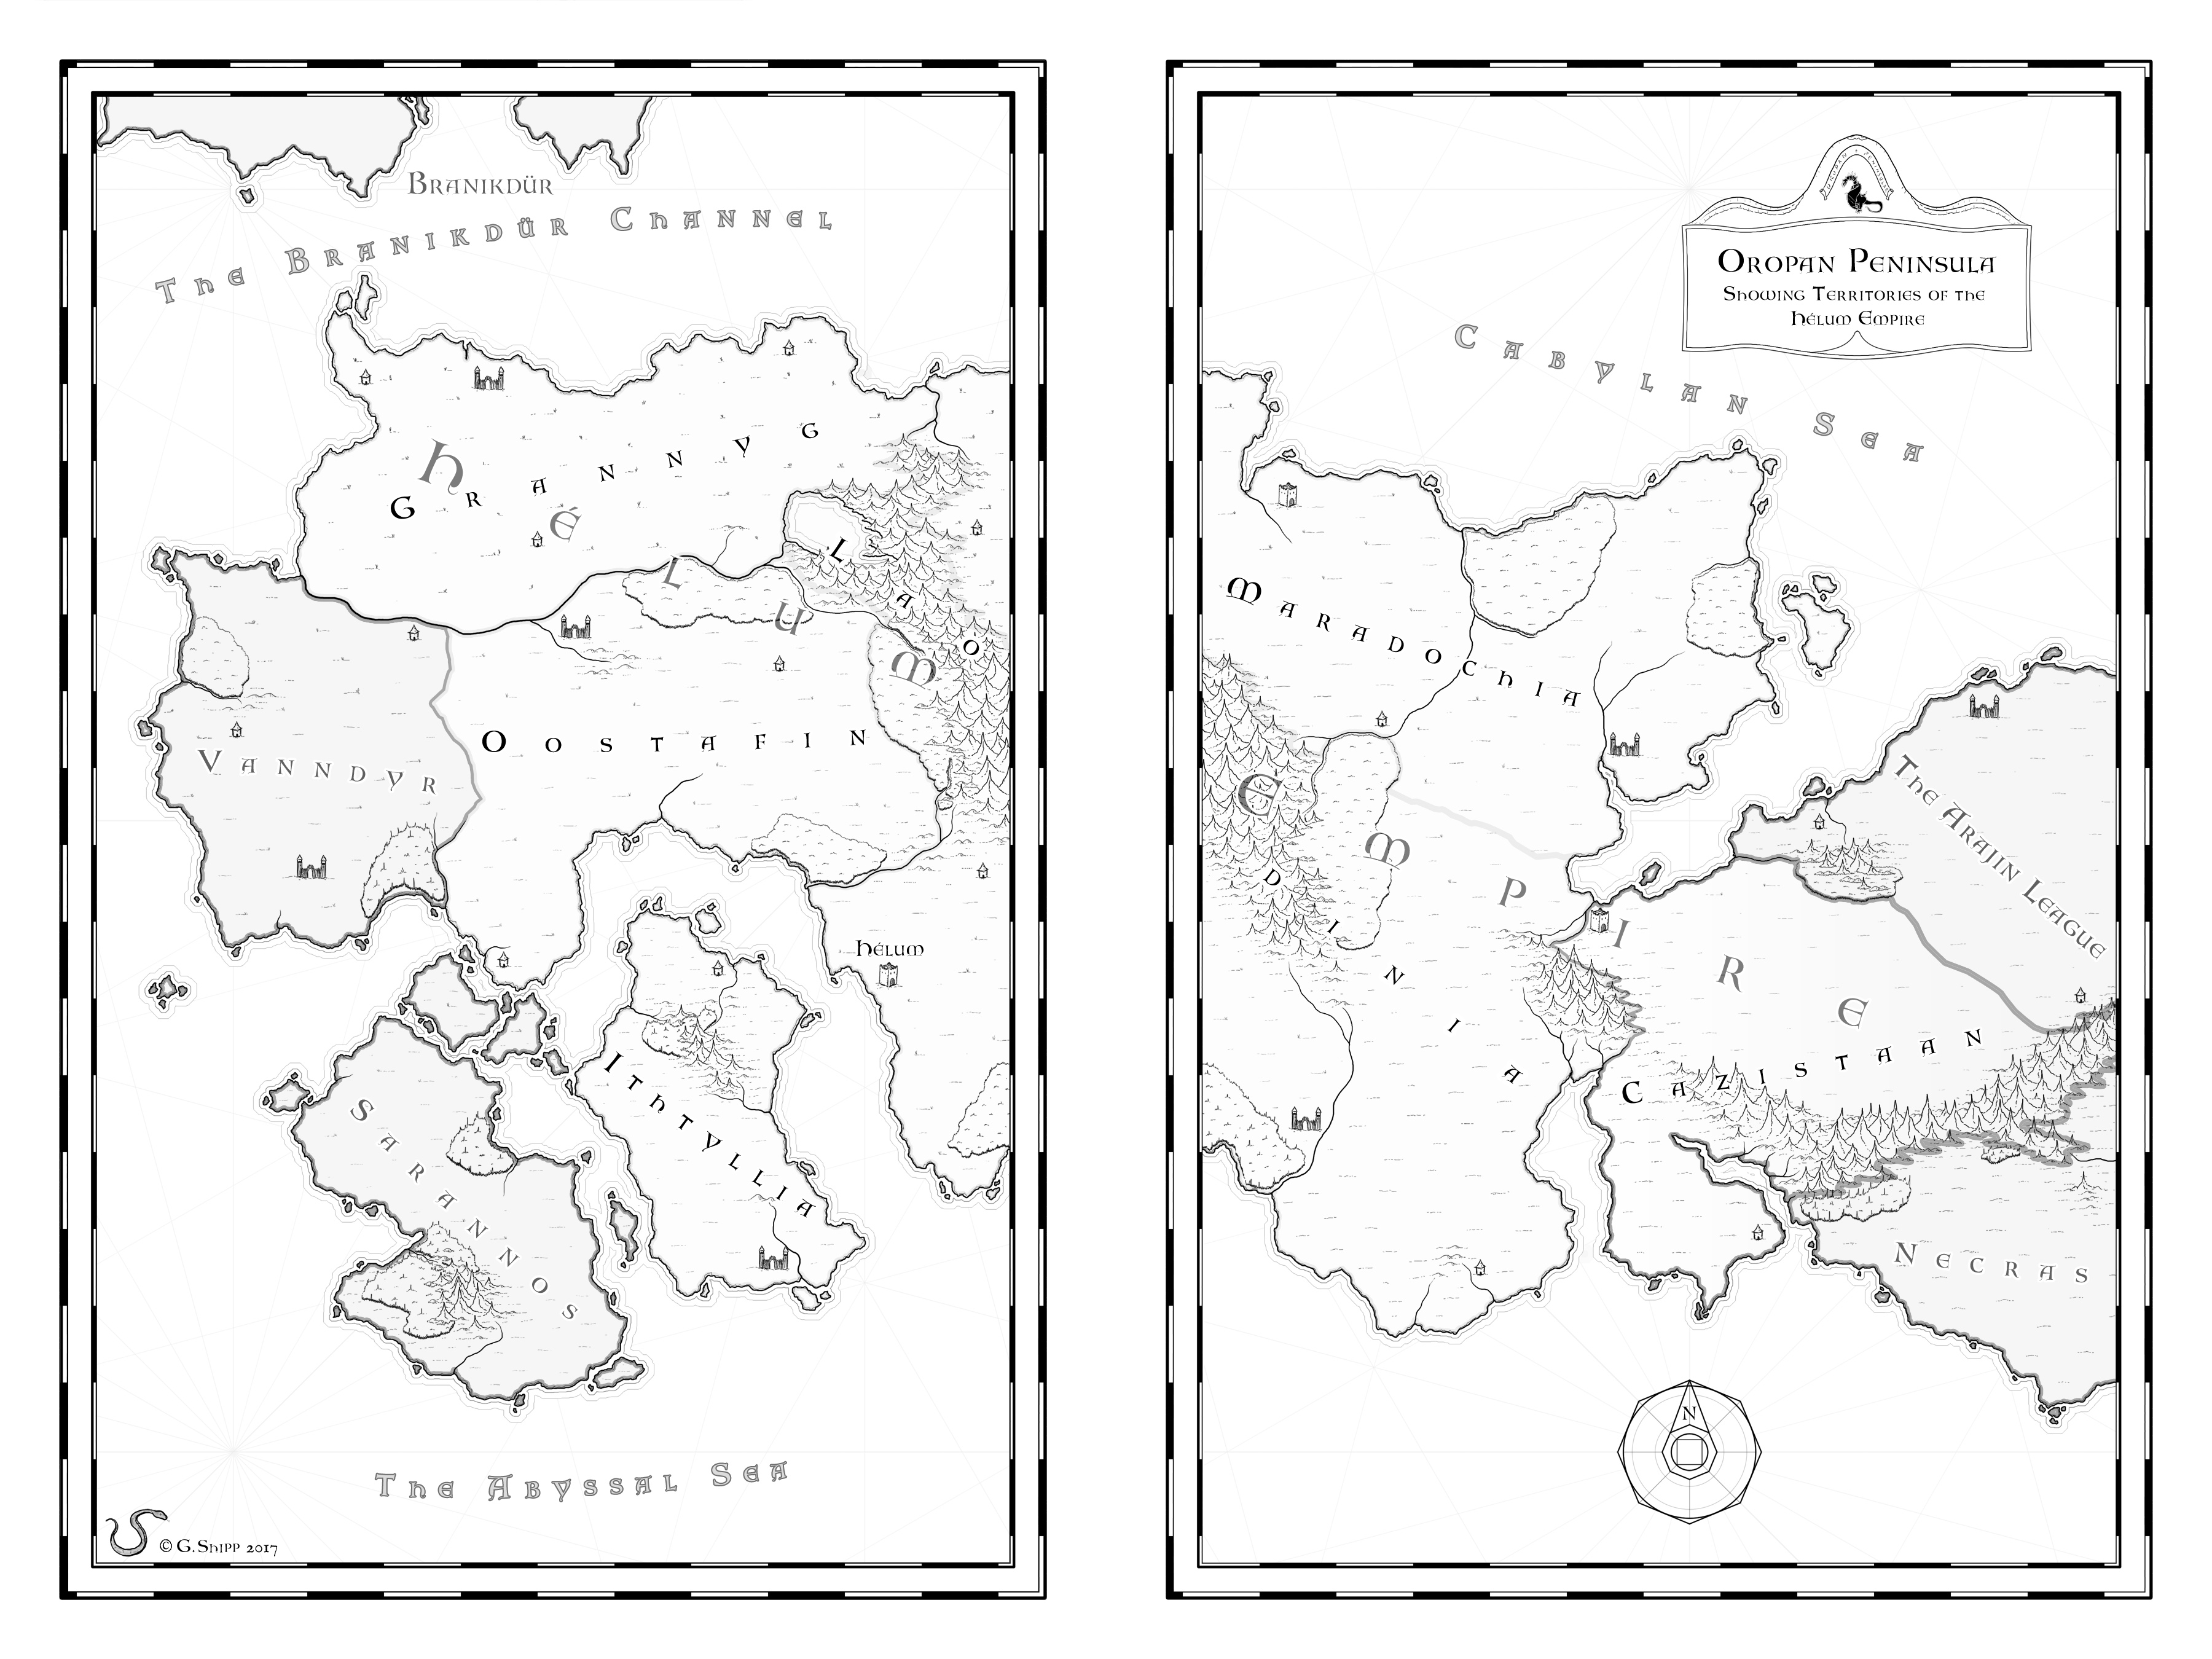 Oropan Peninsula FINAL